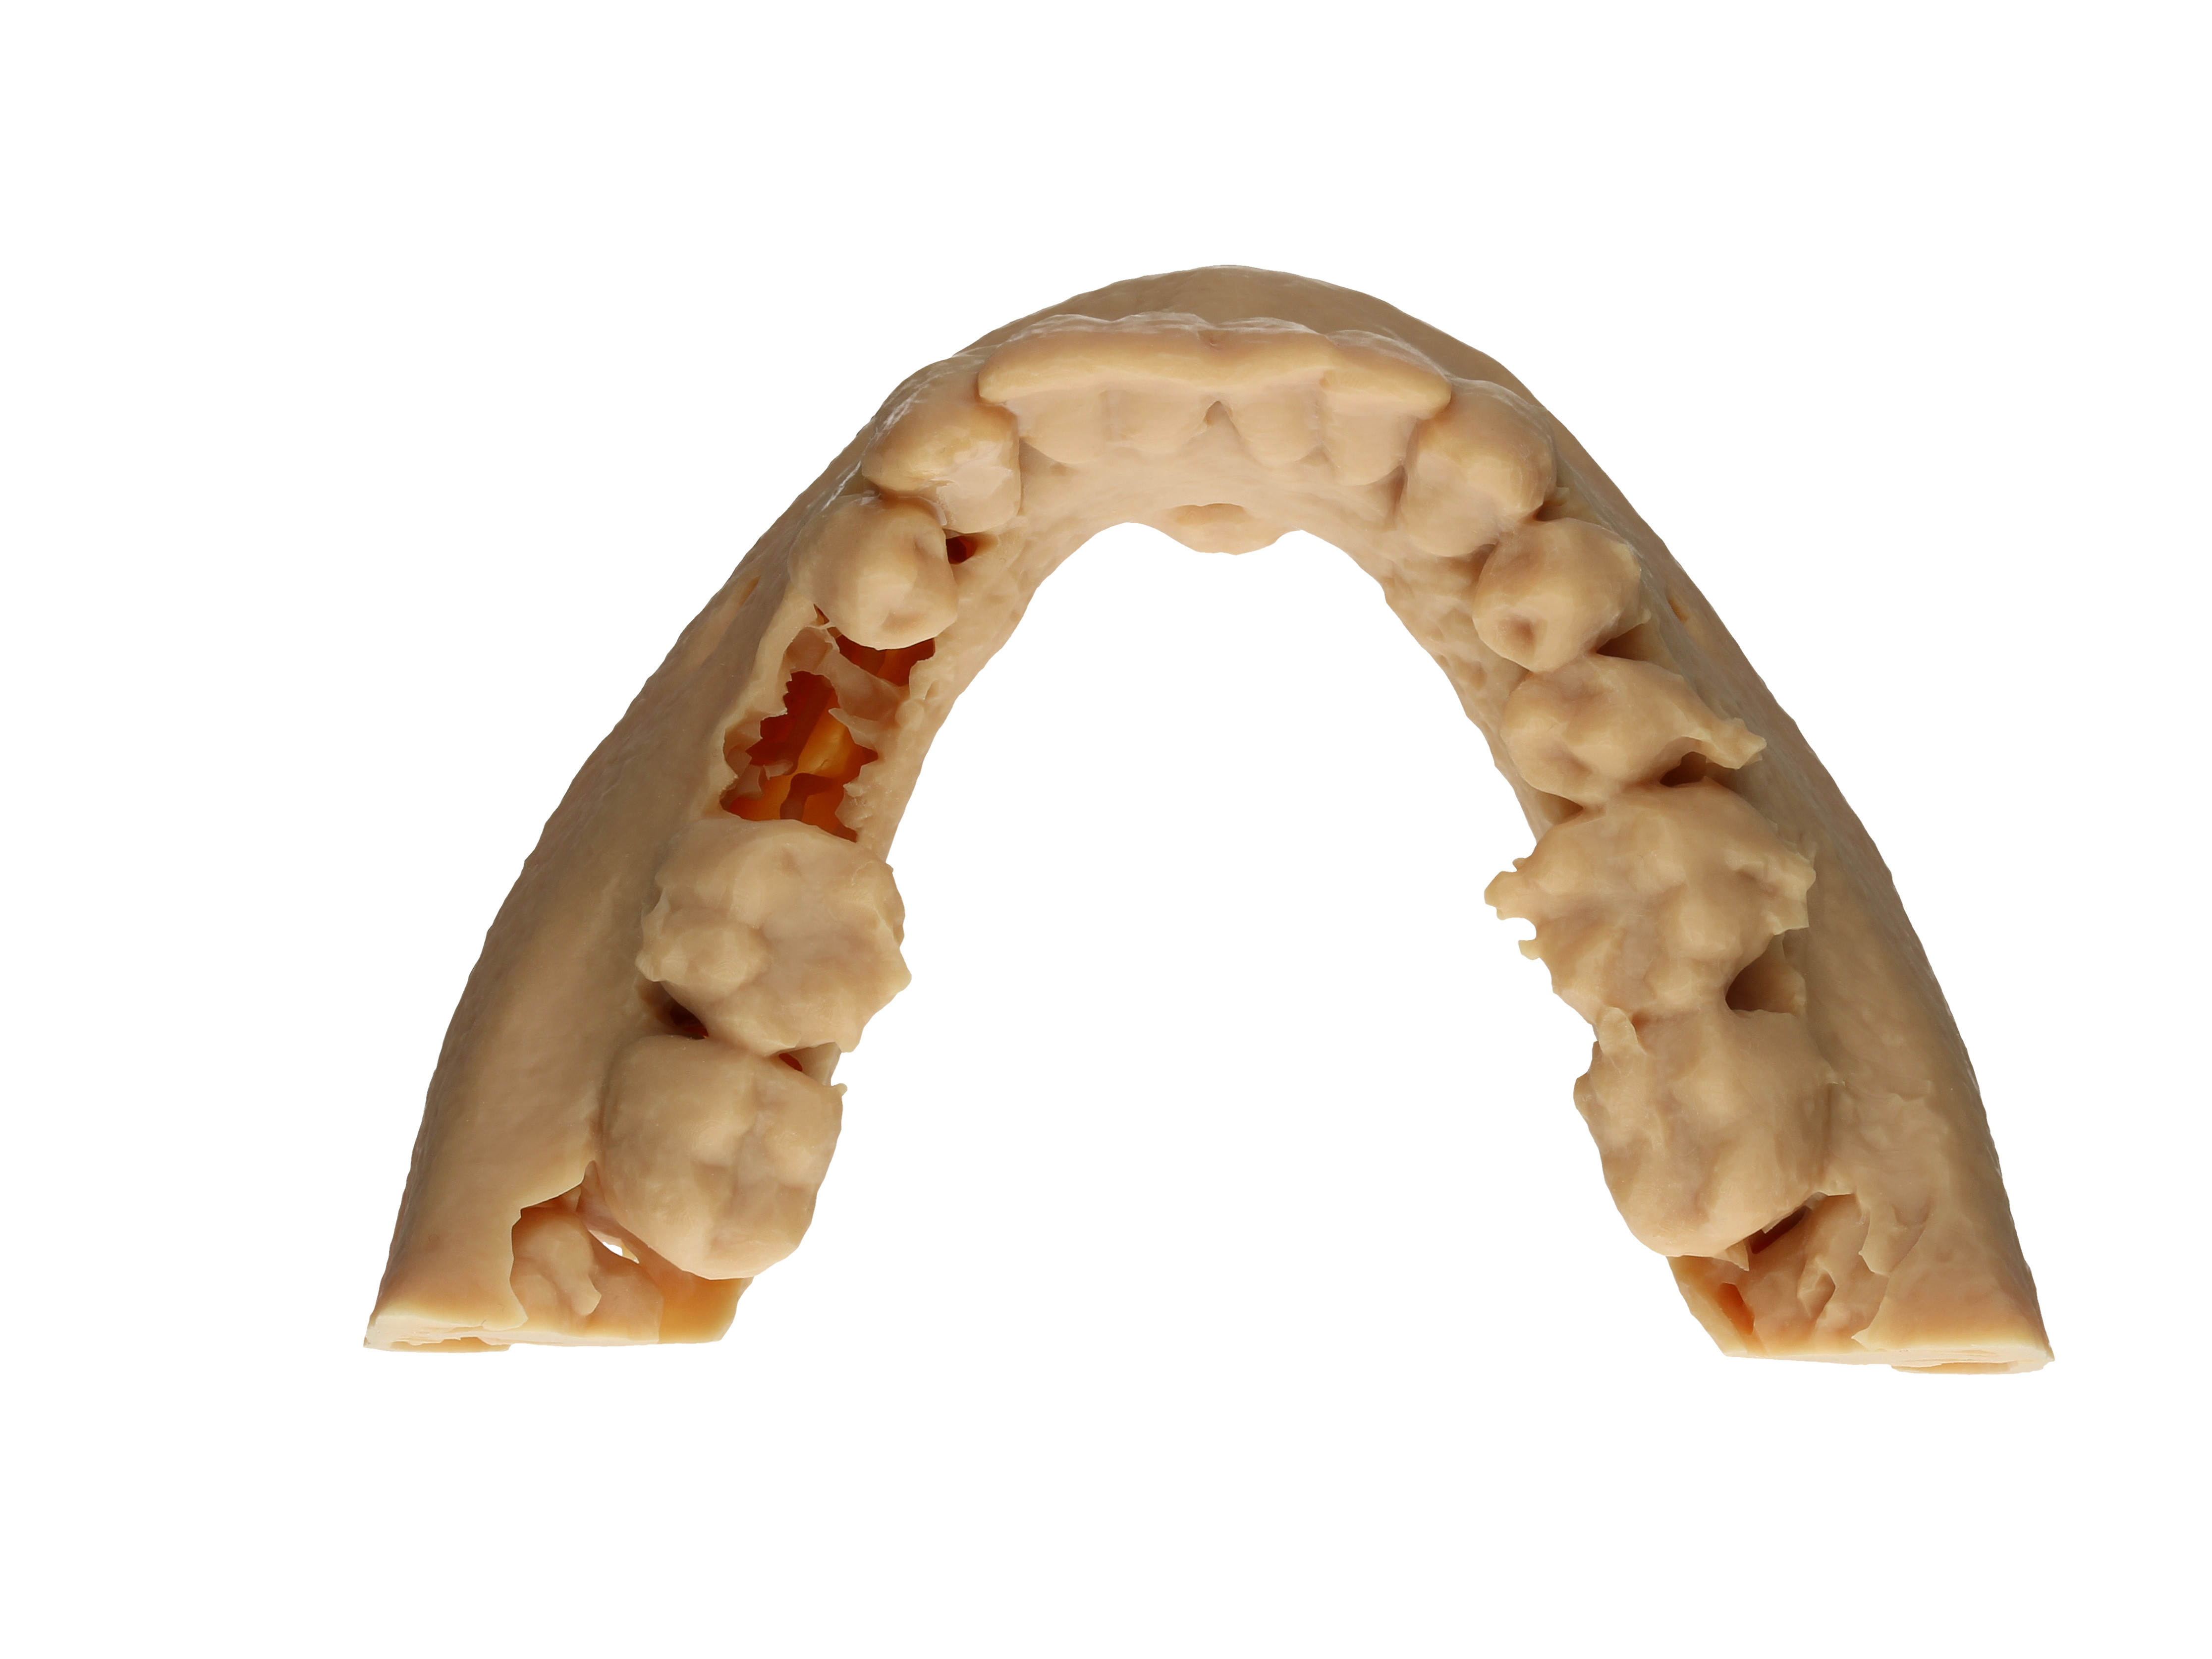 Modell des Unterkiefers aus okklusaler Ansicht